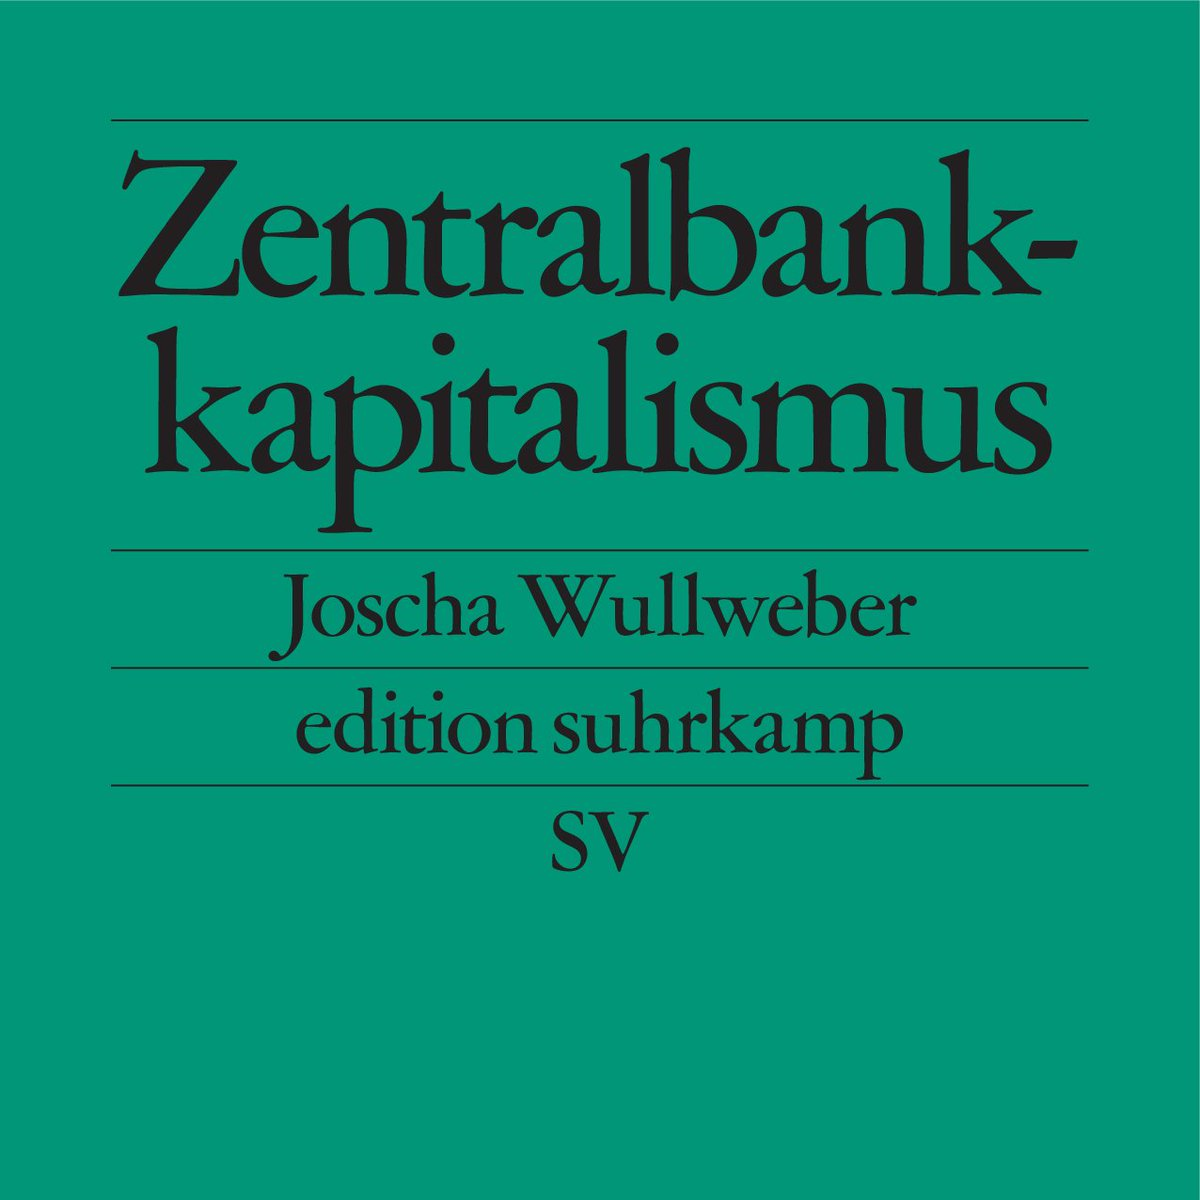 Joscha Wullweber Jwullweber Twitter